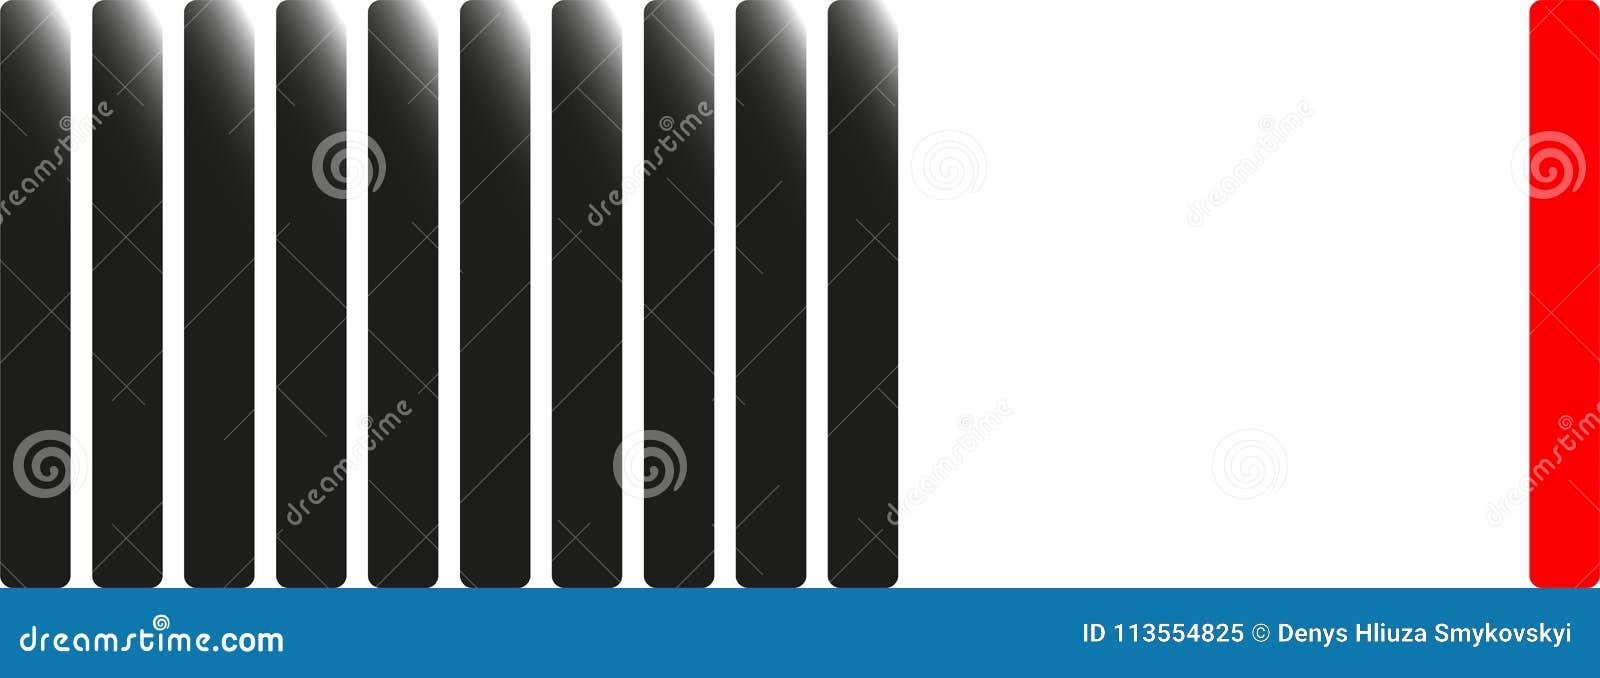 vertical stripes illustration on a theme teamwork stock